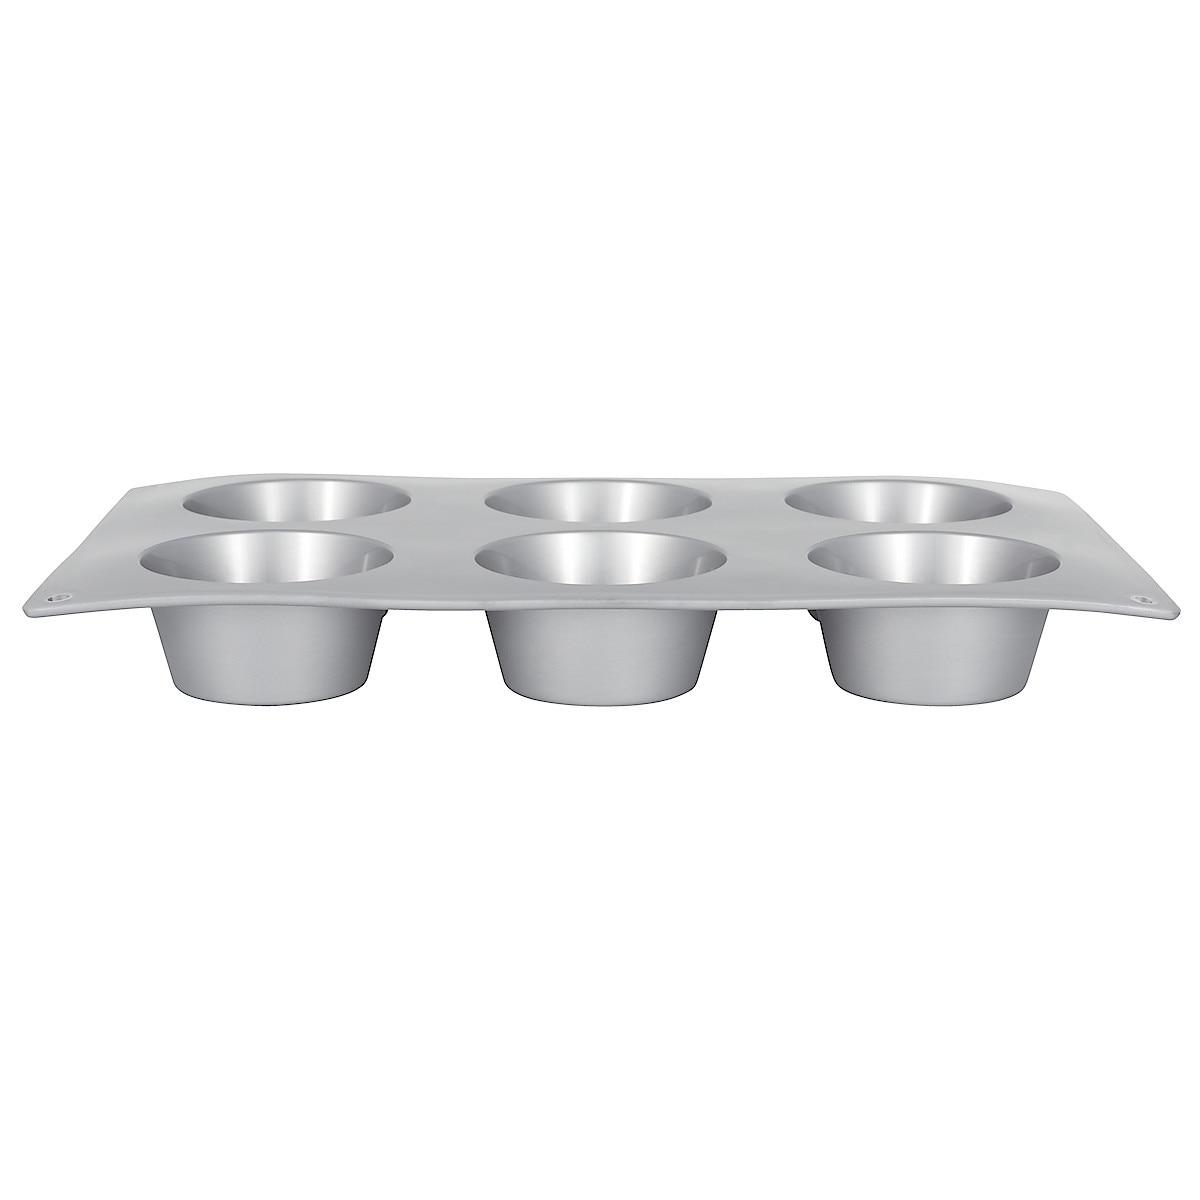 Silikomart Silicone Baking Pans